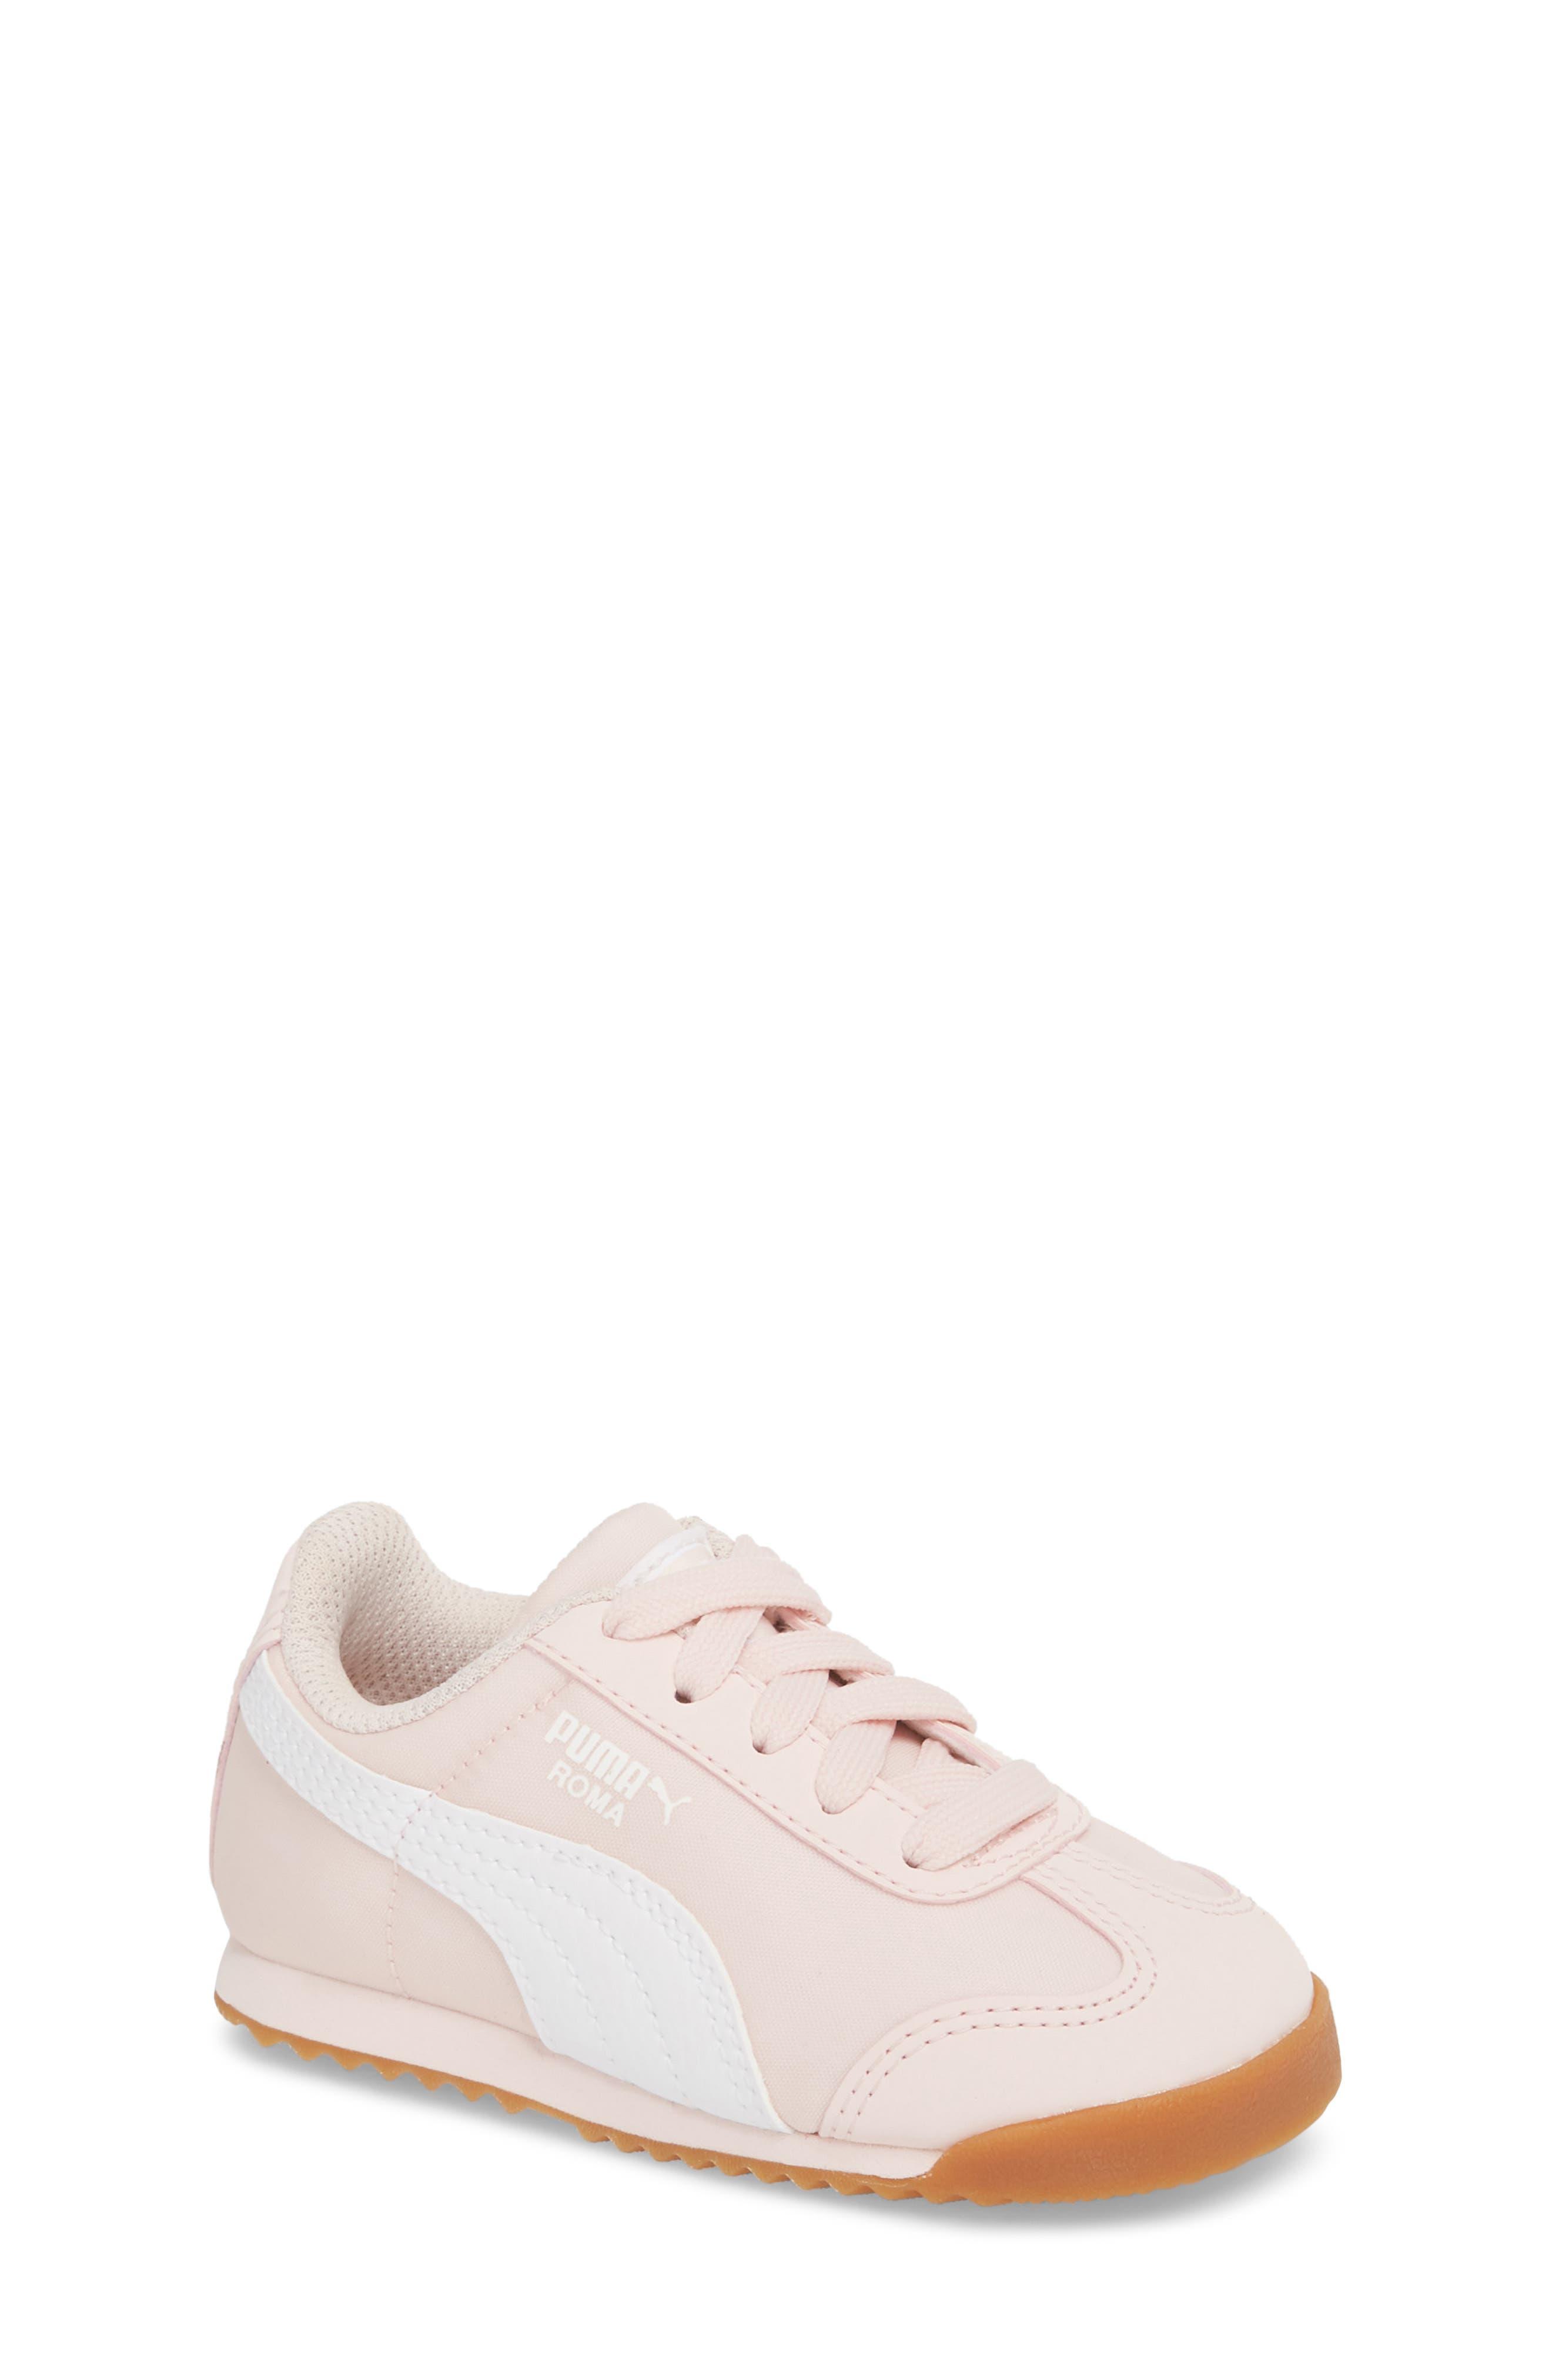 PUMA Roma Basic Summer Sneaker, Main, color, 100